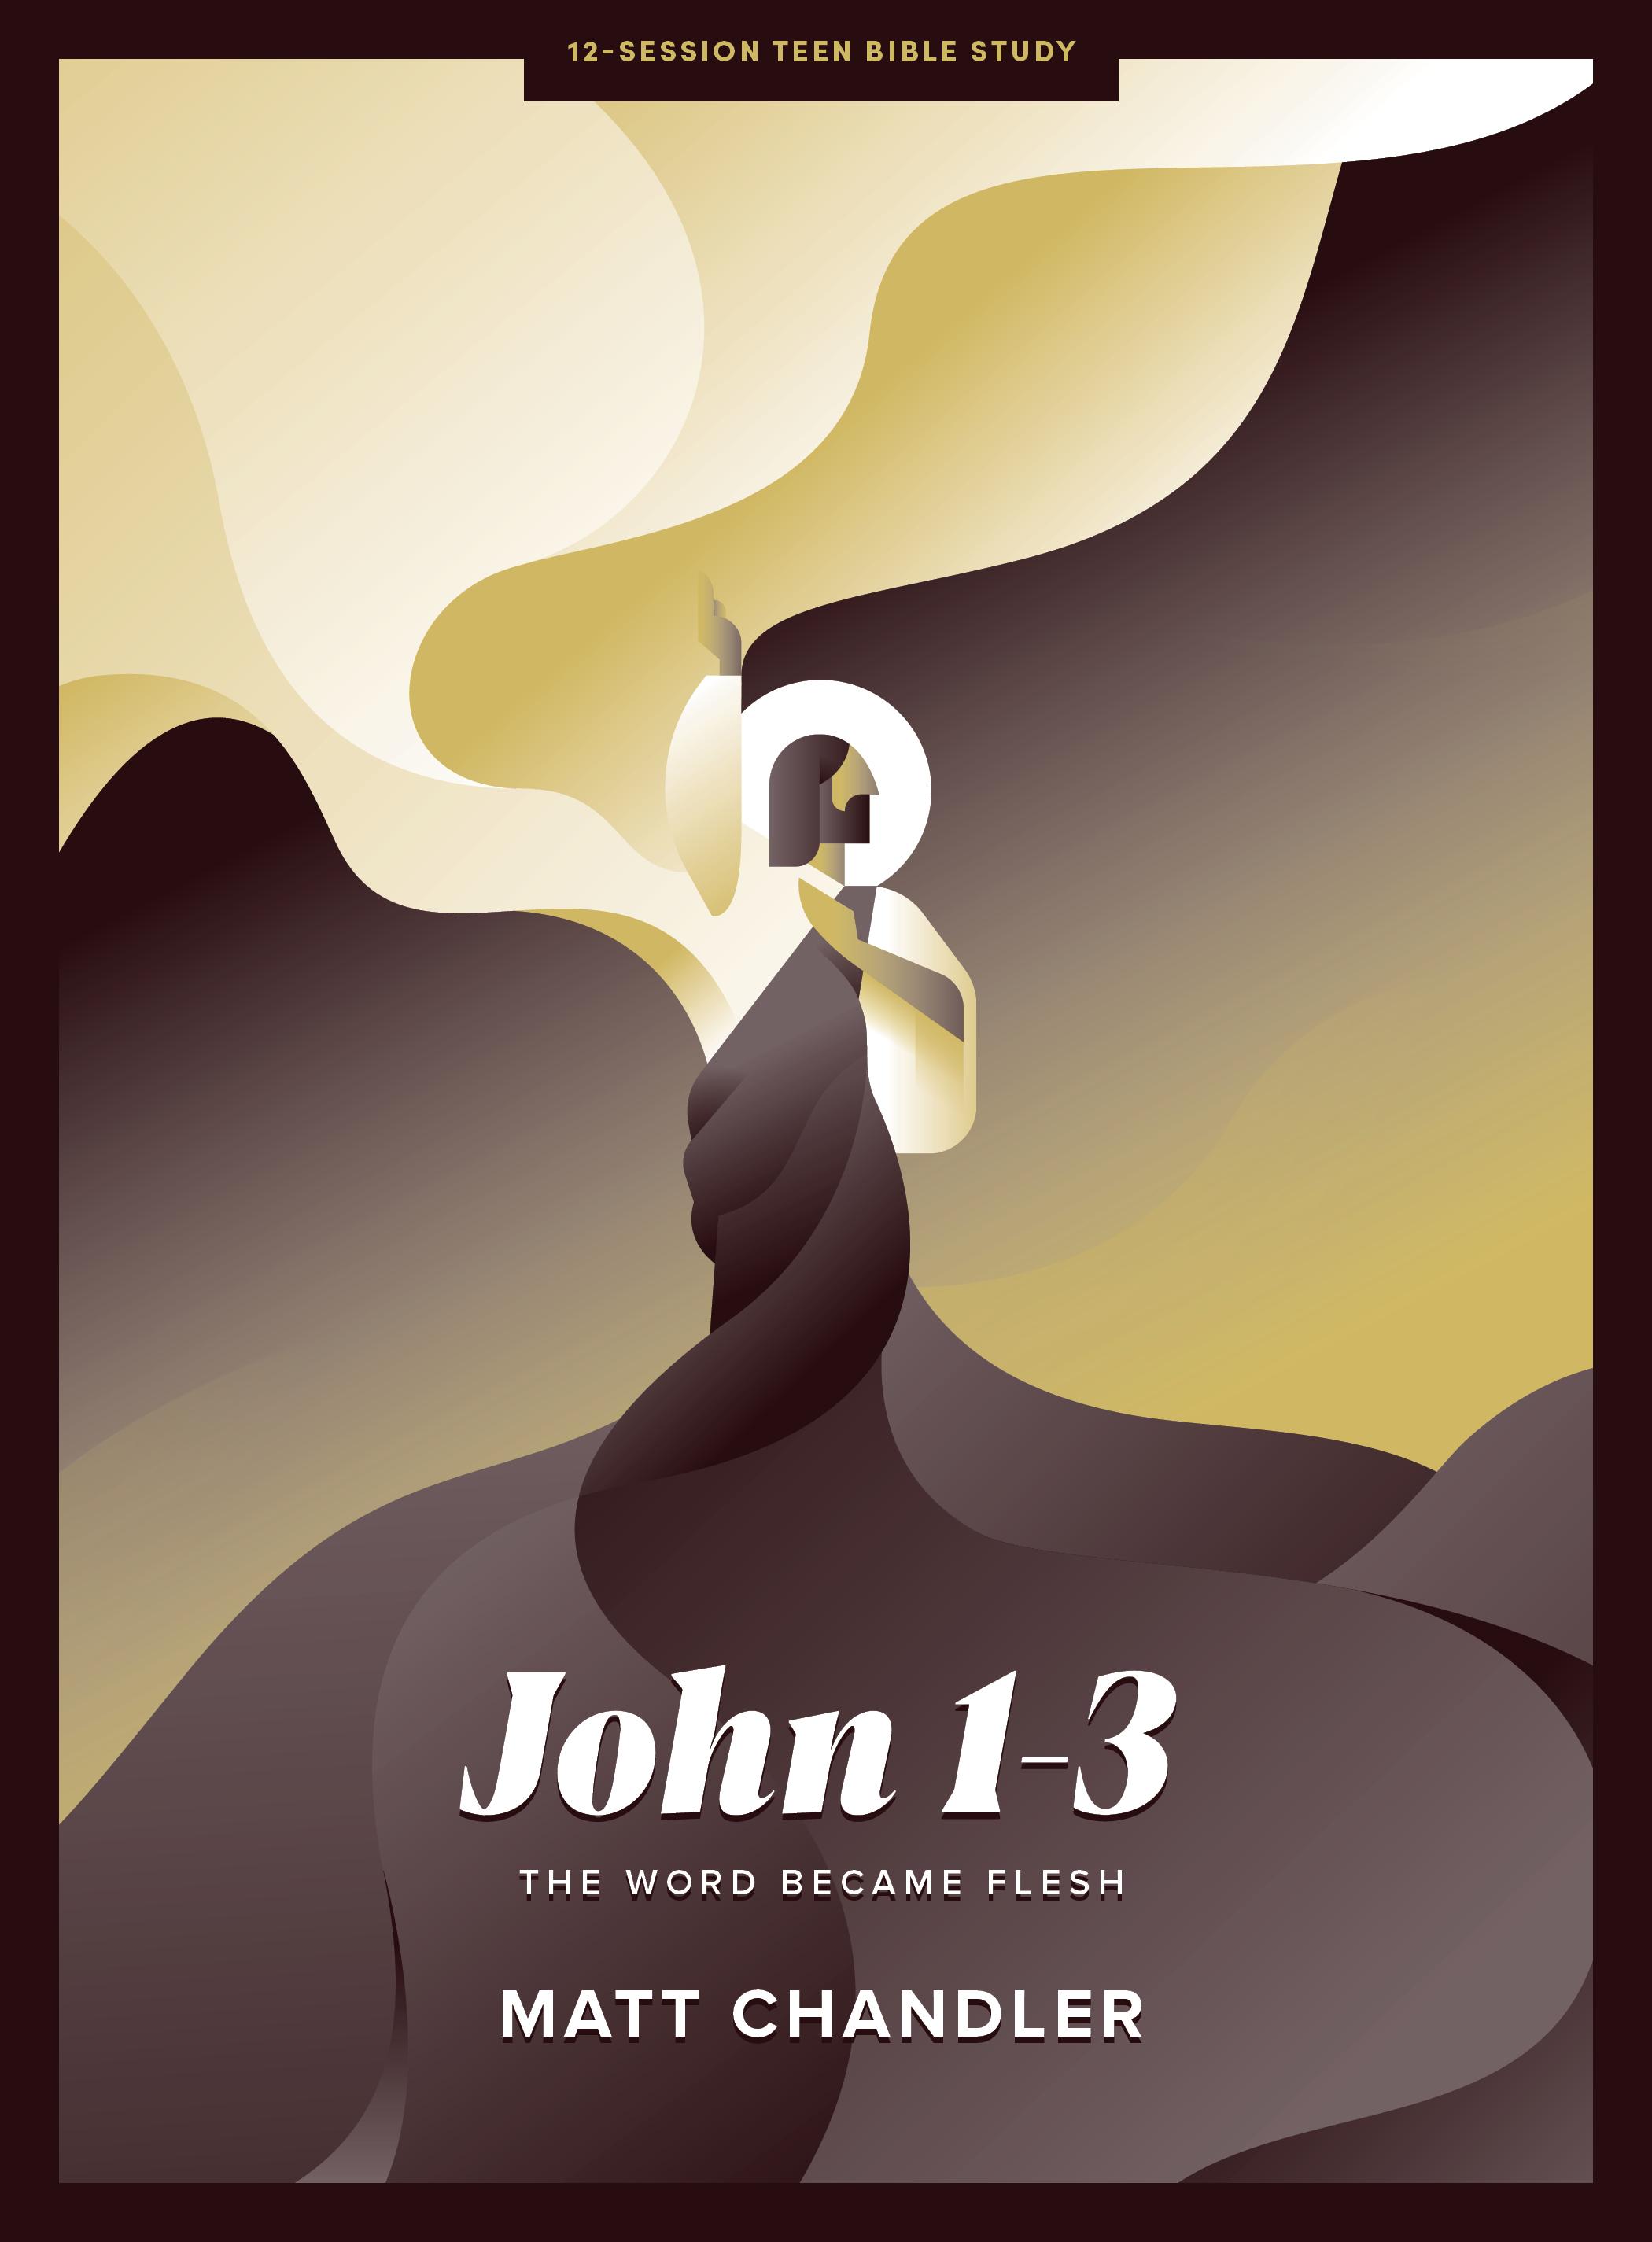 John 1-3 Bible Study